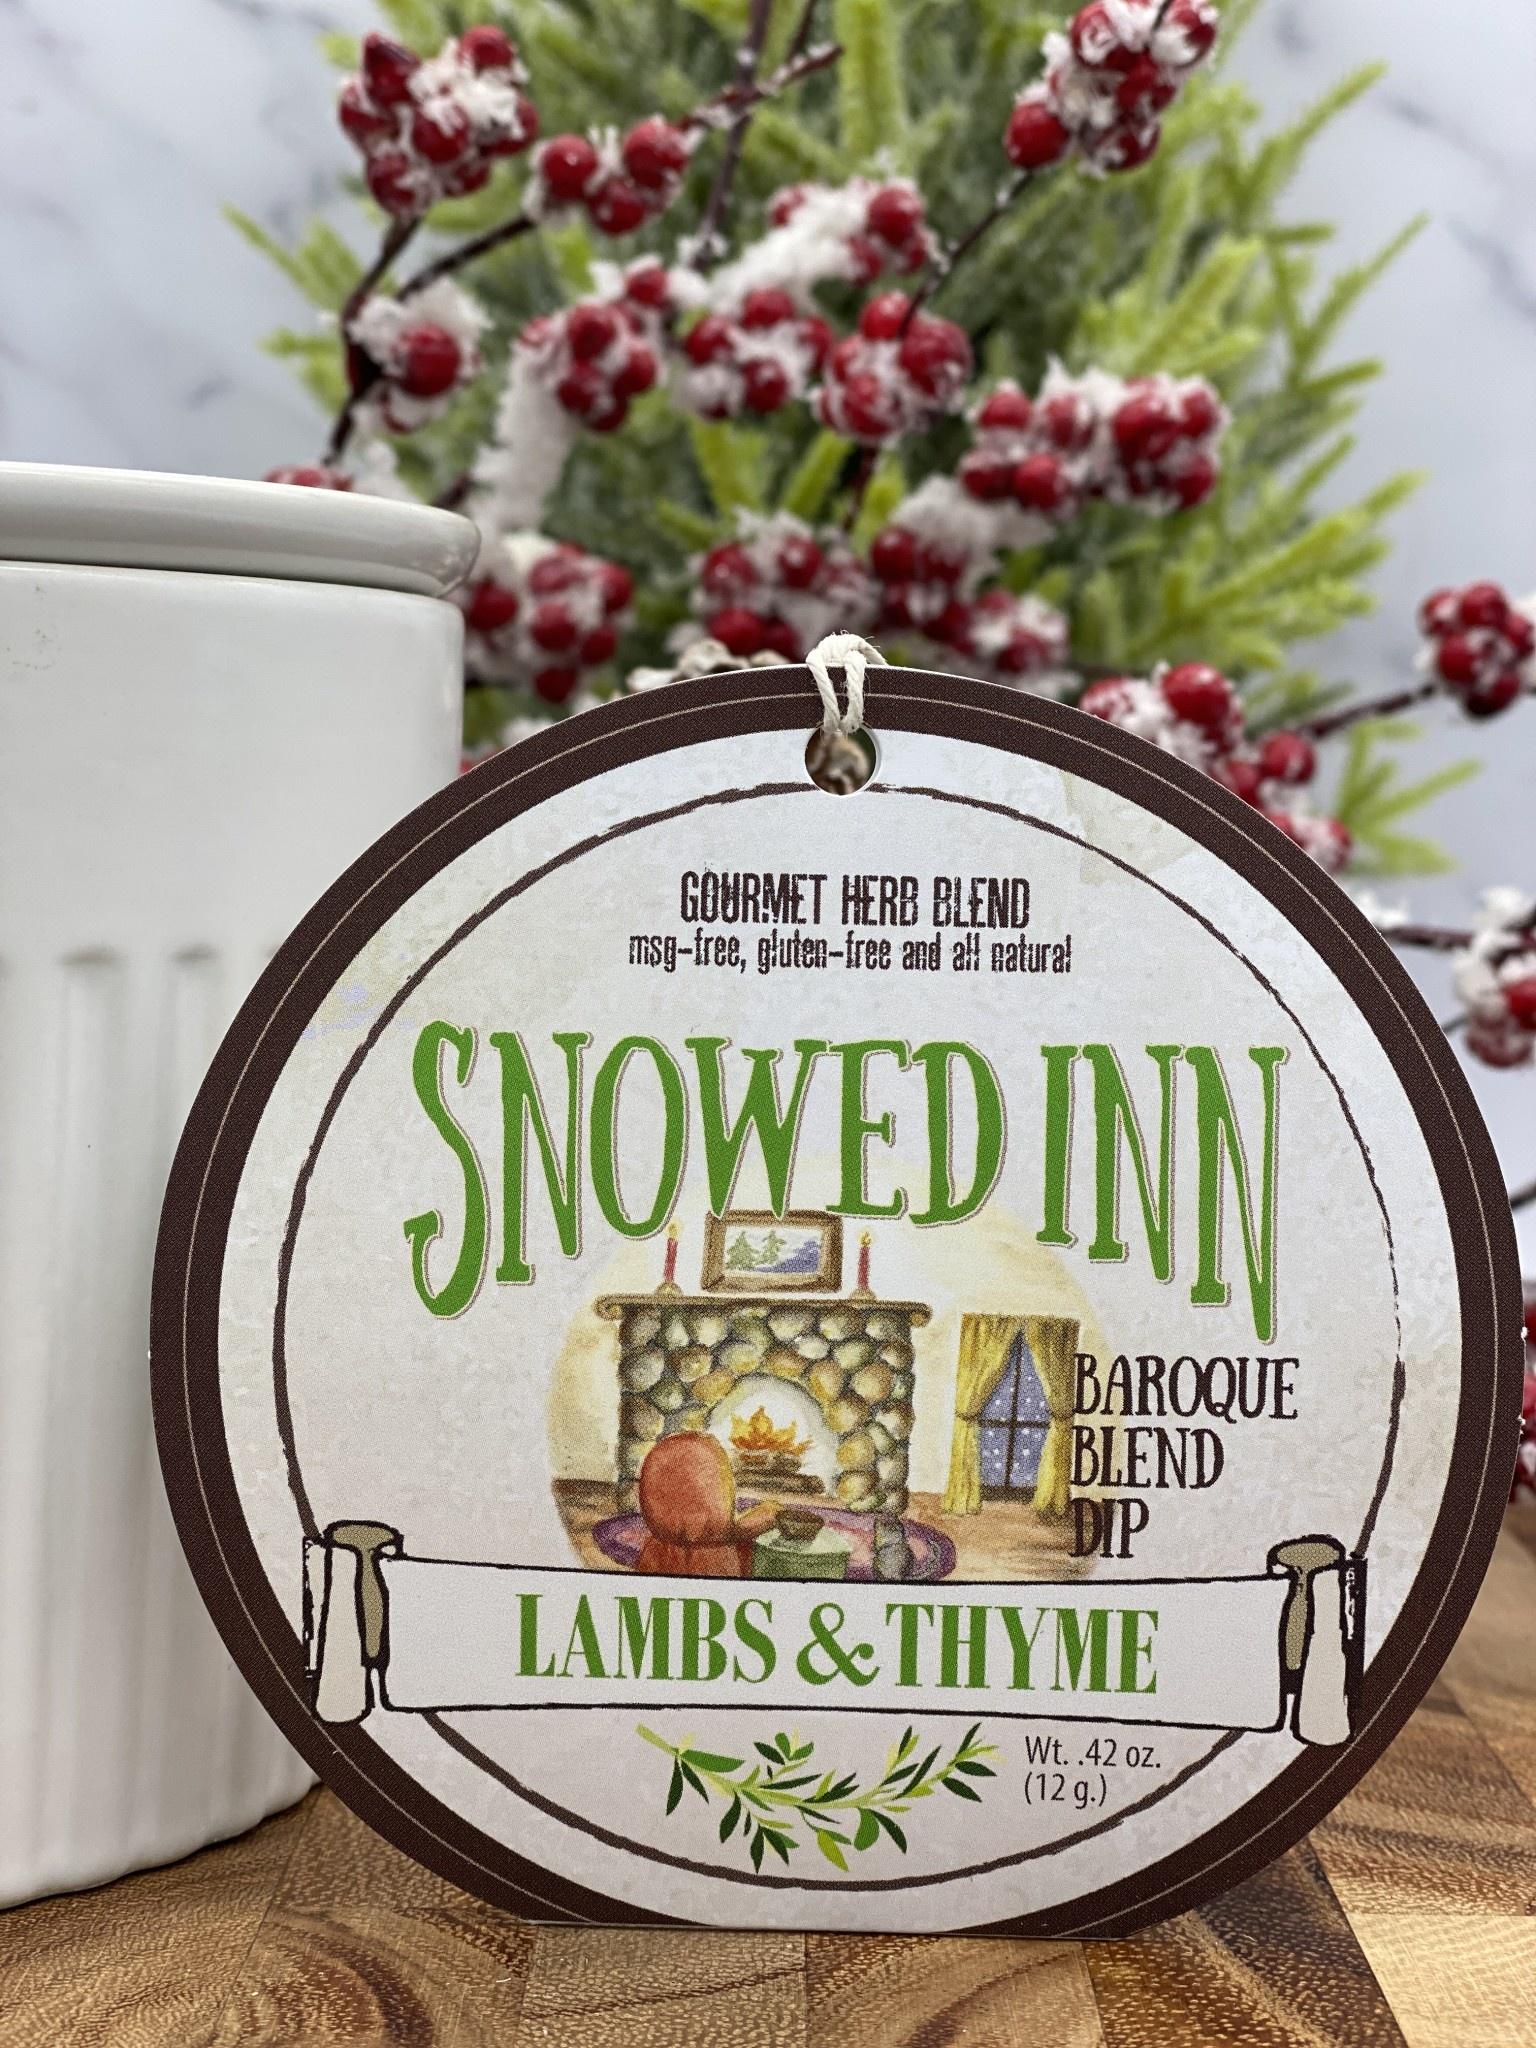 Lambs & Thyme Holiday Dips Snowed Inn